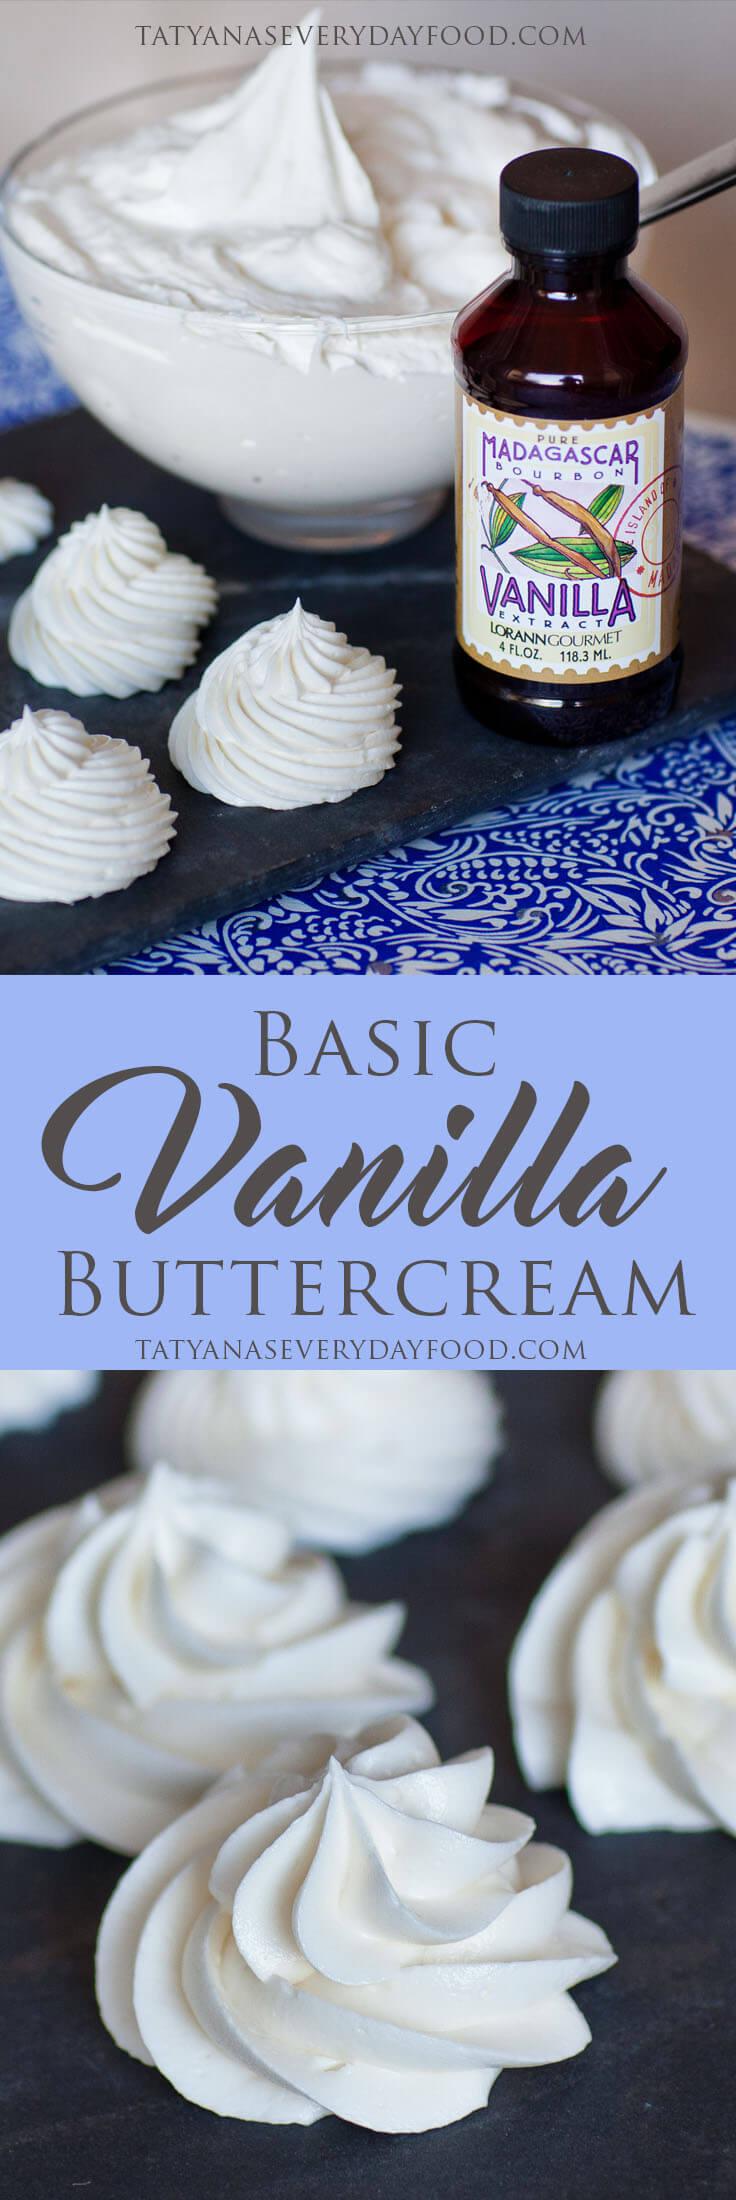 Basic Vanilla Buttercream Recipe with video